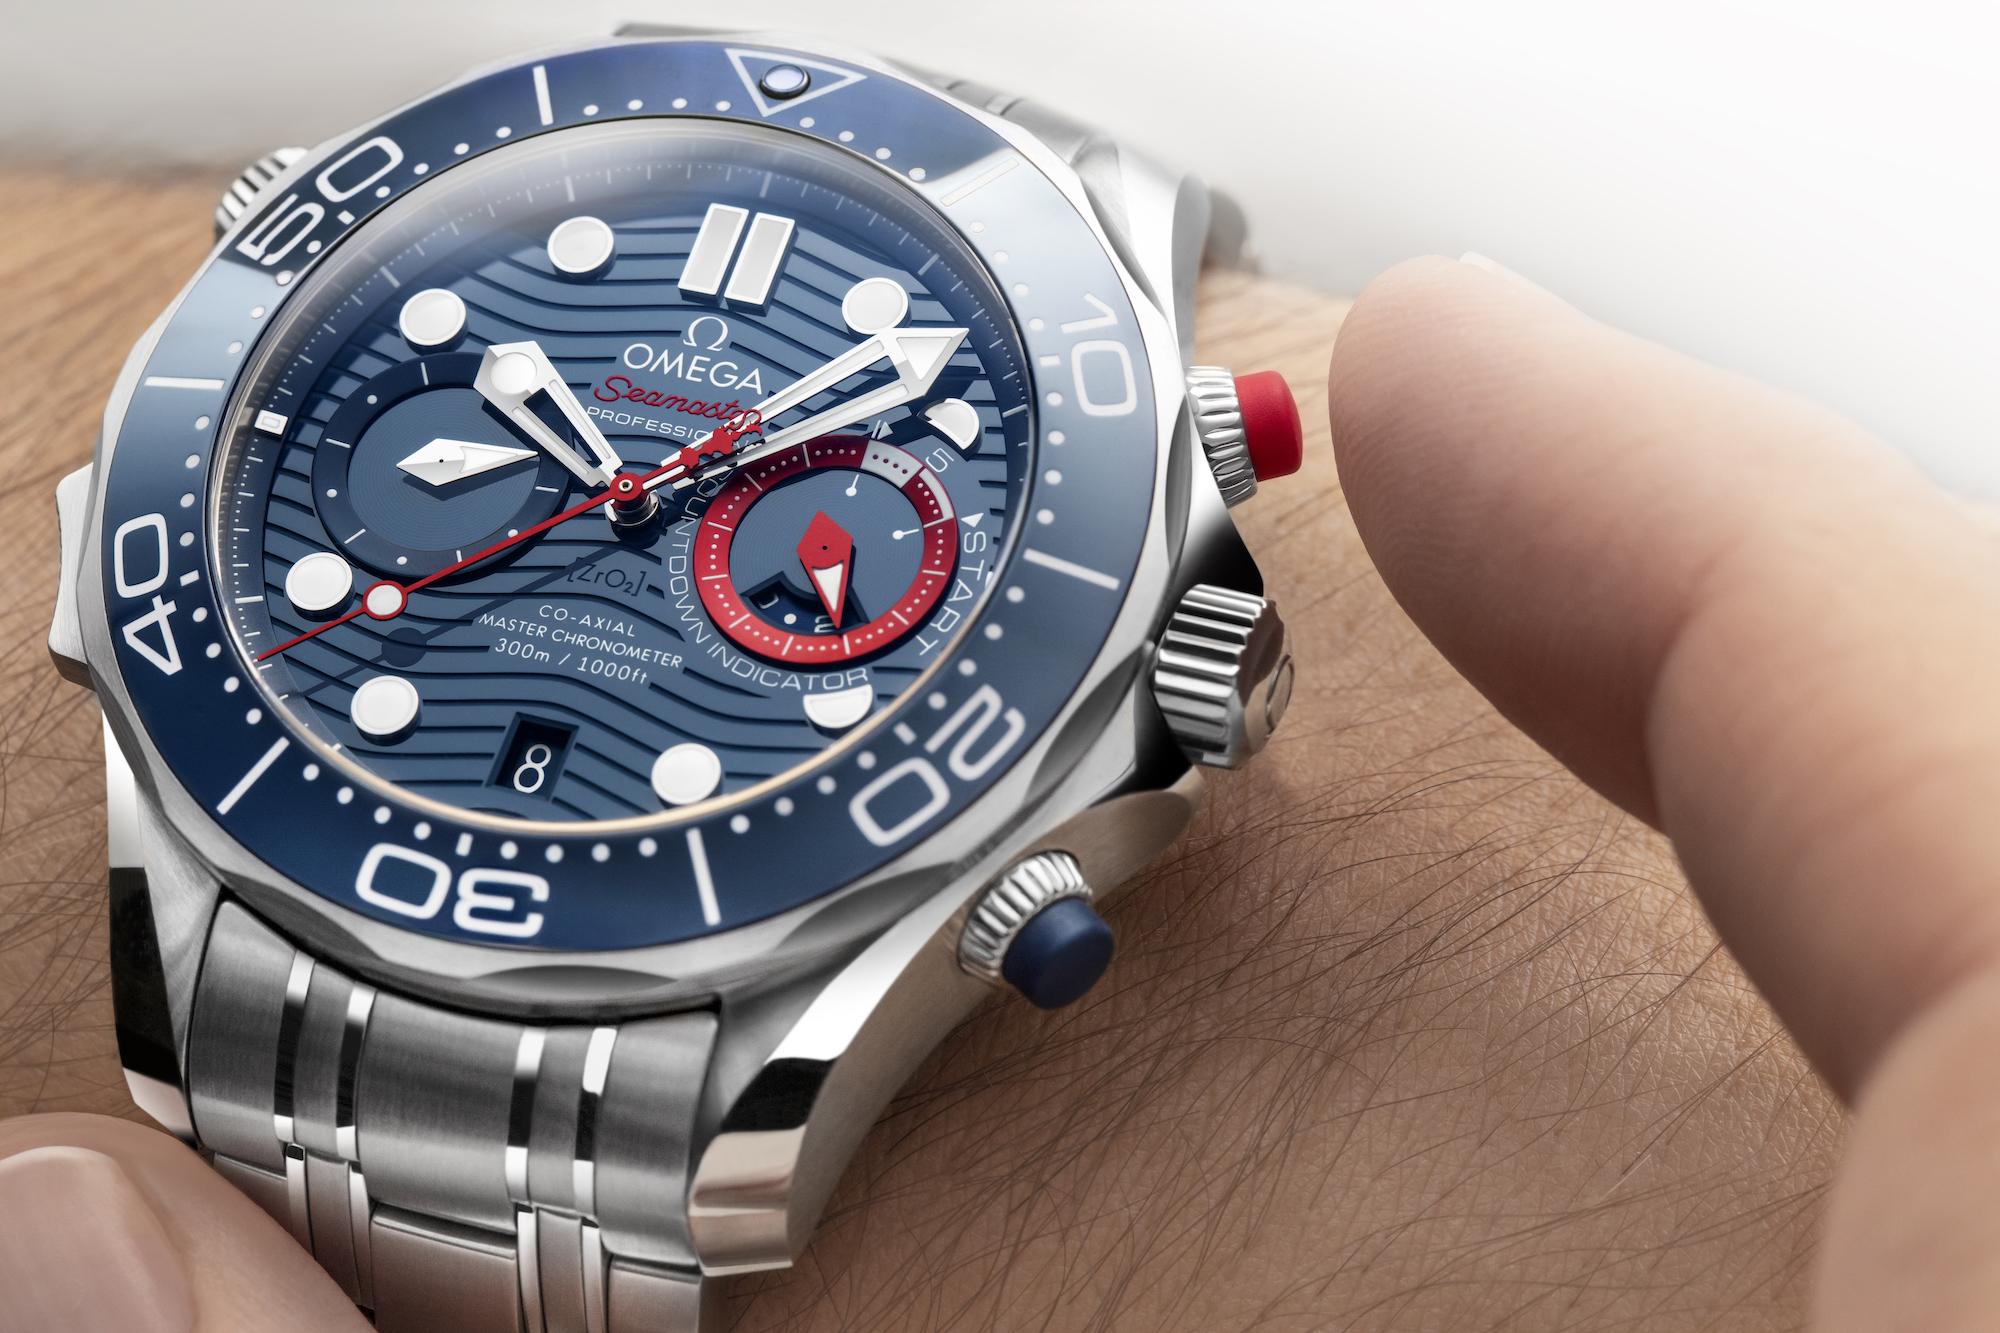 Omega Seamaster Diver 300M Americas Cup Chronograph 210.30.44.51.03.002 pulsadores cronógrafo